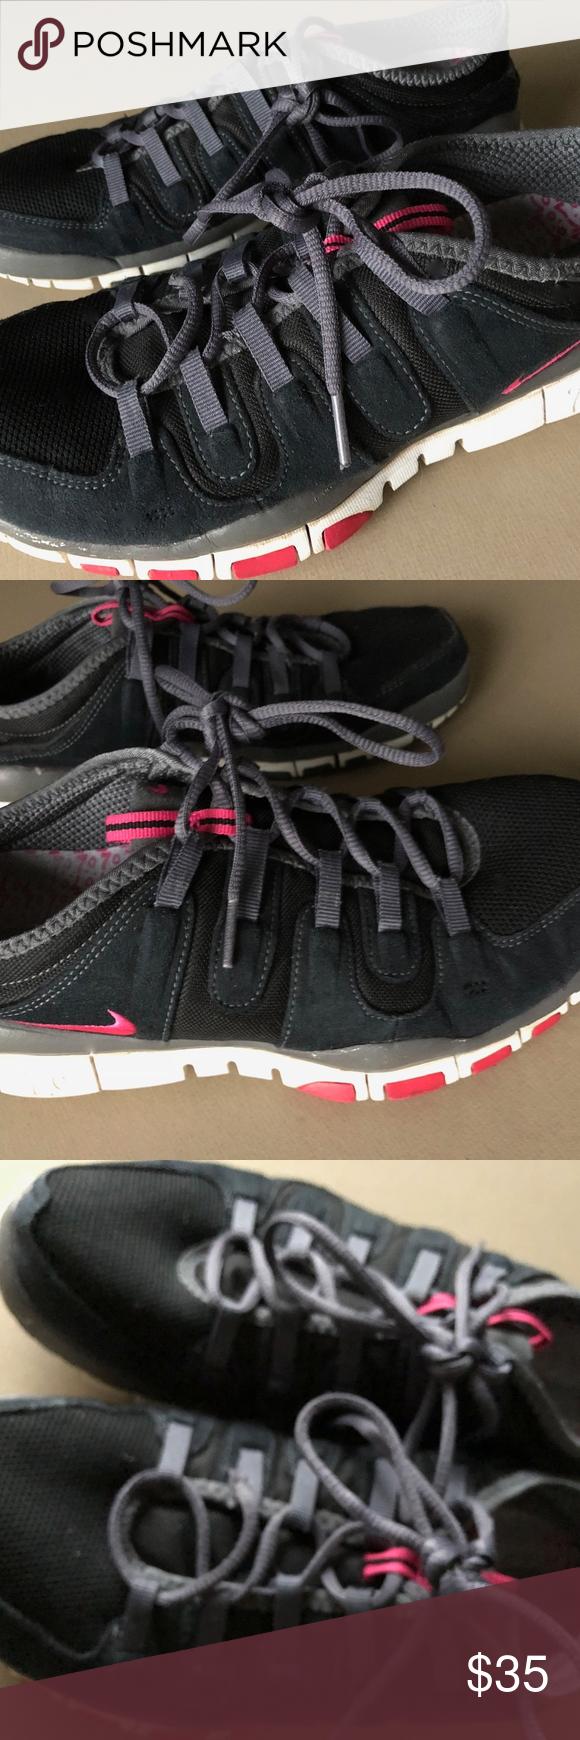 75093316adb6 ... germany nike free 7.0 black pink sneaker gym shoe womens nike free 7.0  mesh suede upper